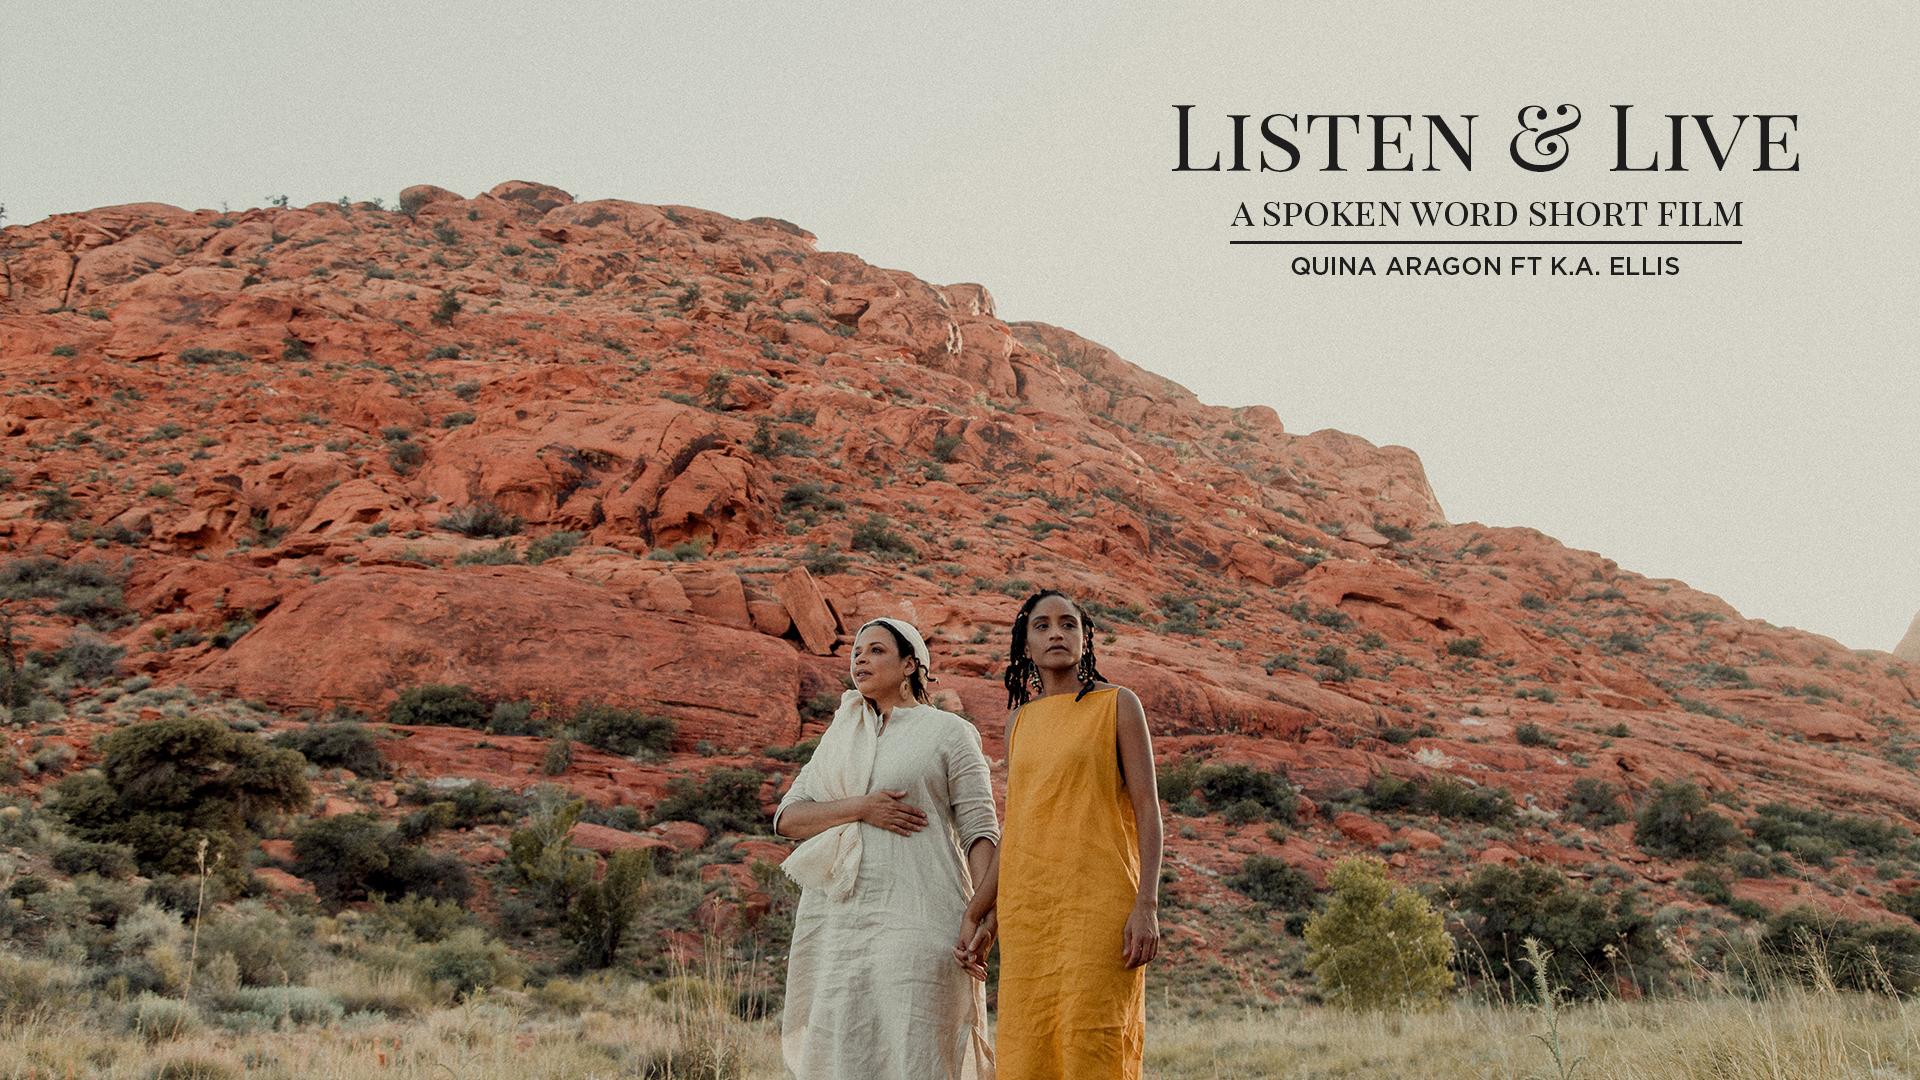 Listen & Live Spoken Word Short Film Premiere